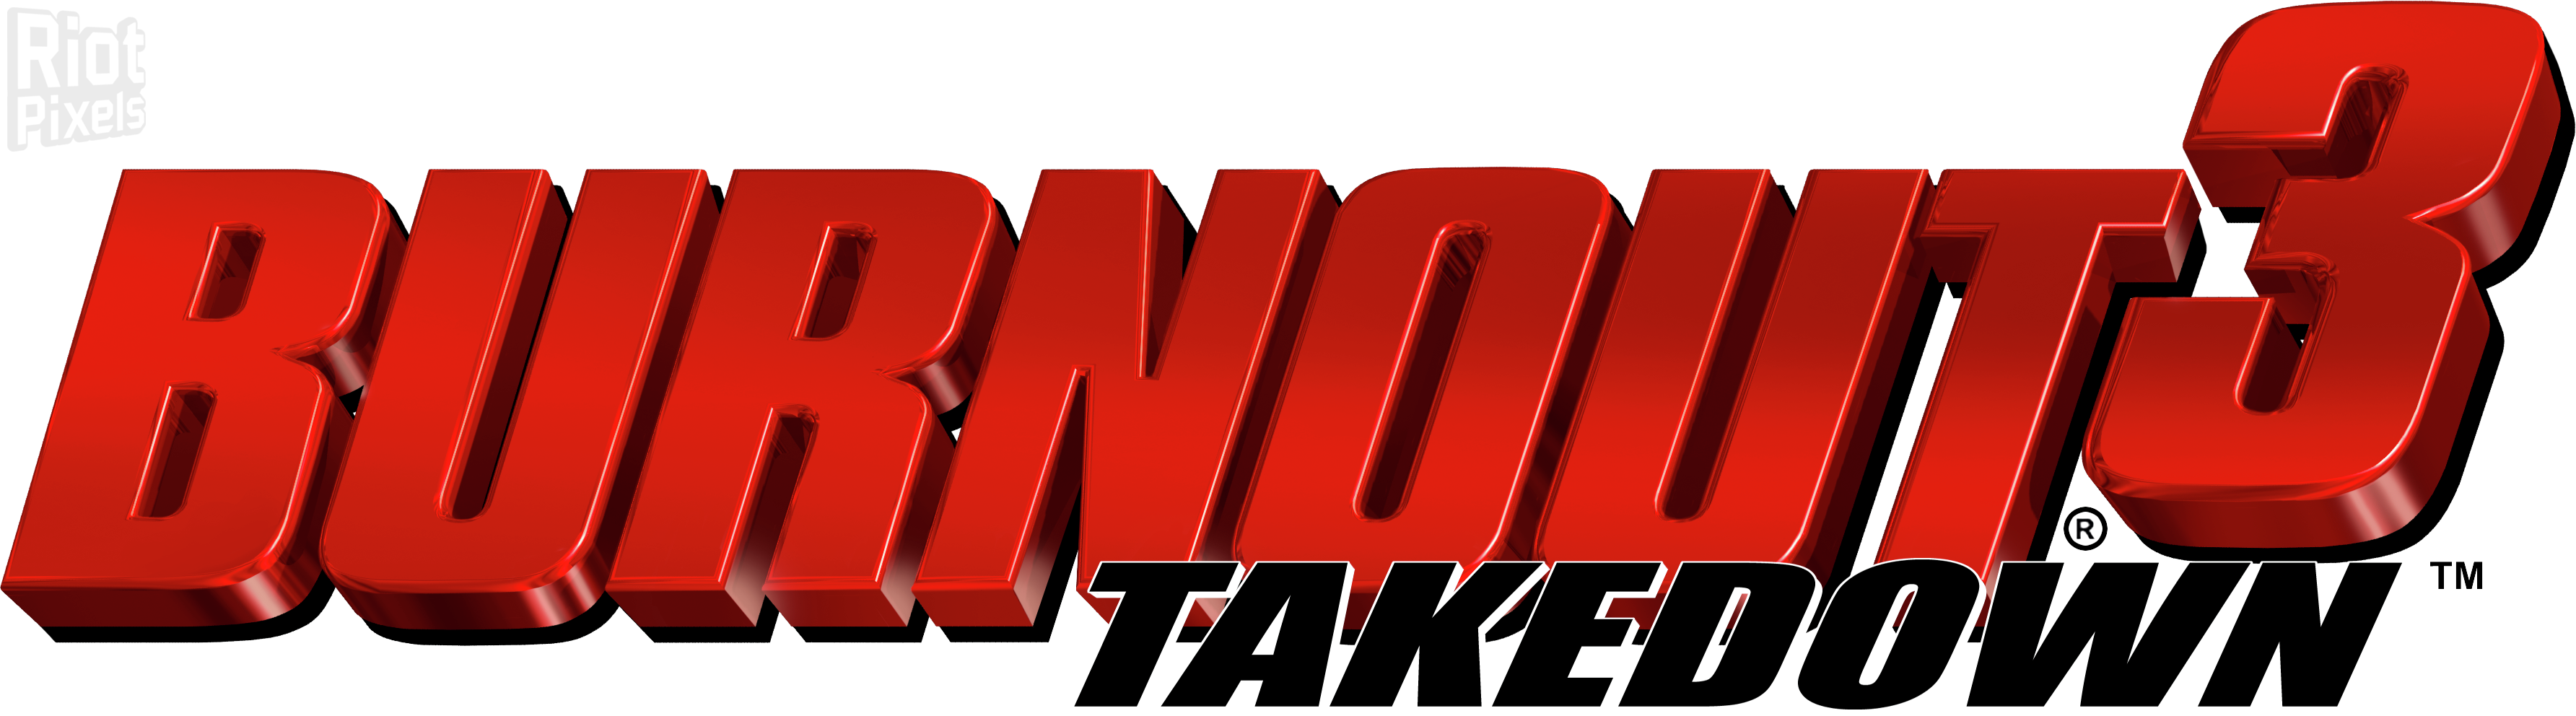 Burnout 3: Takedown - game artworks at Riot Pixels